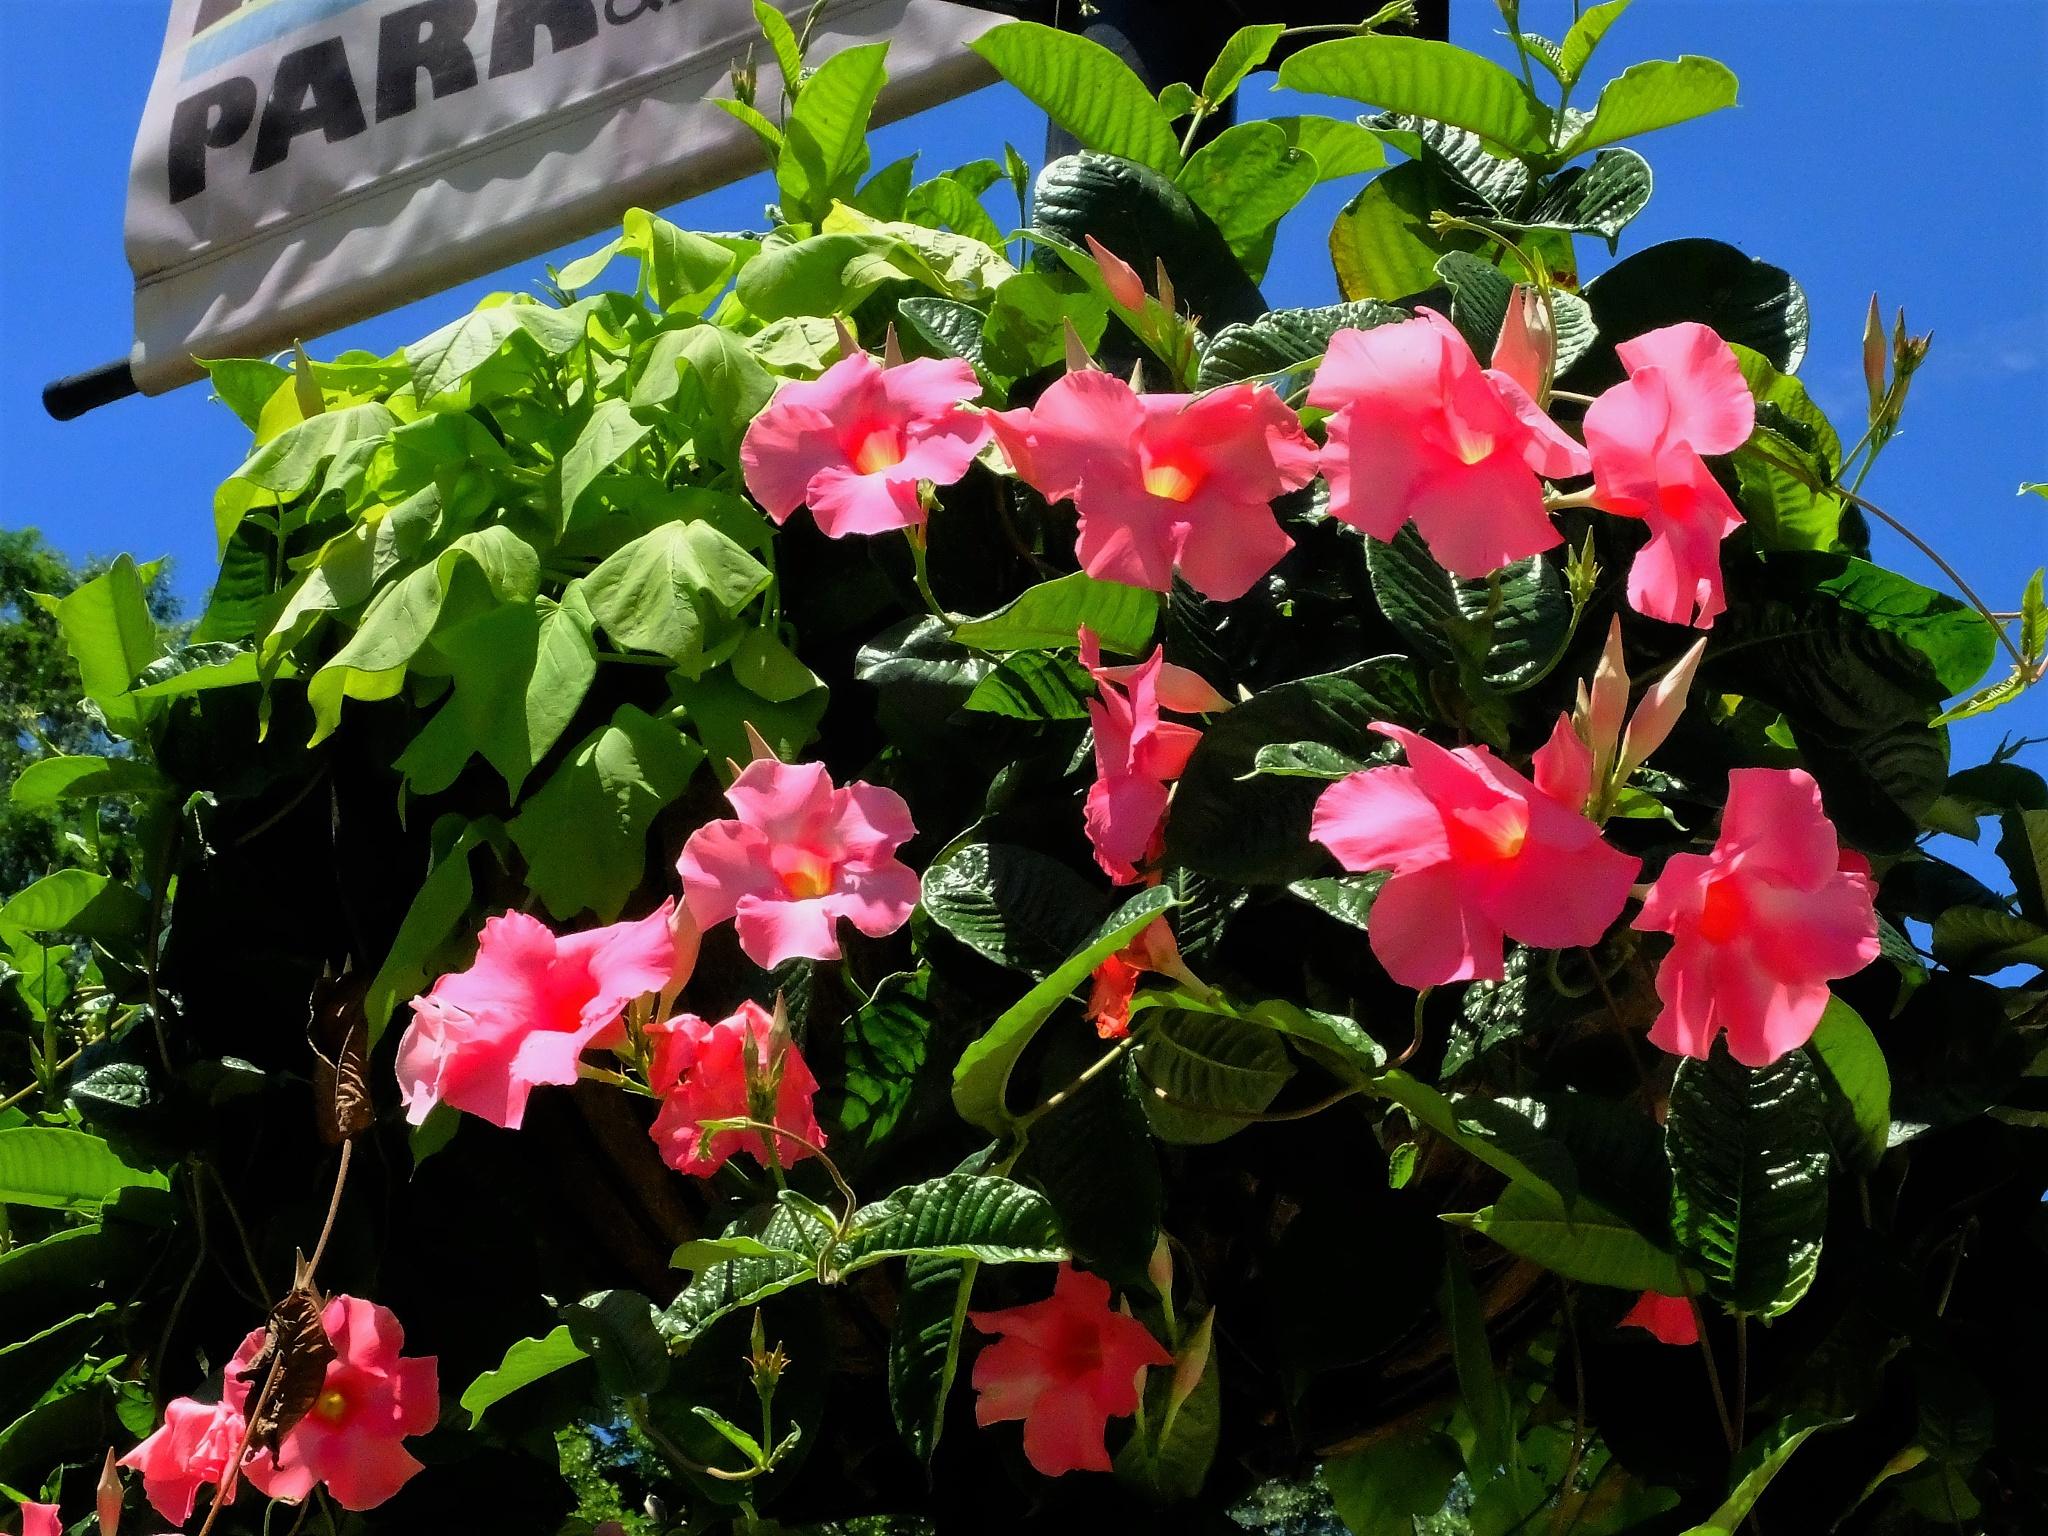 A bushel of pink flowers by vmunoz